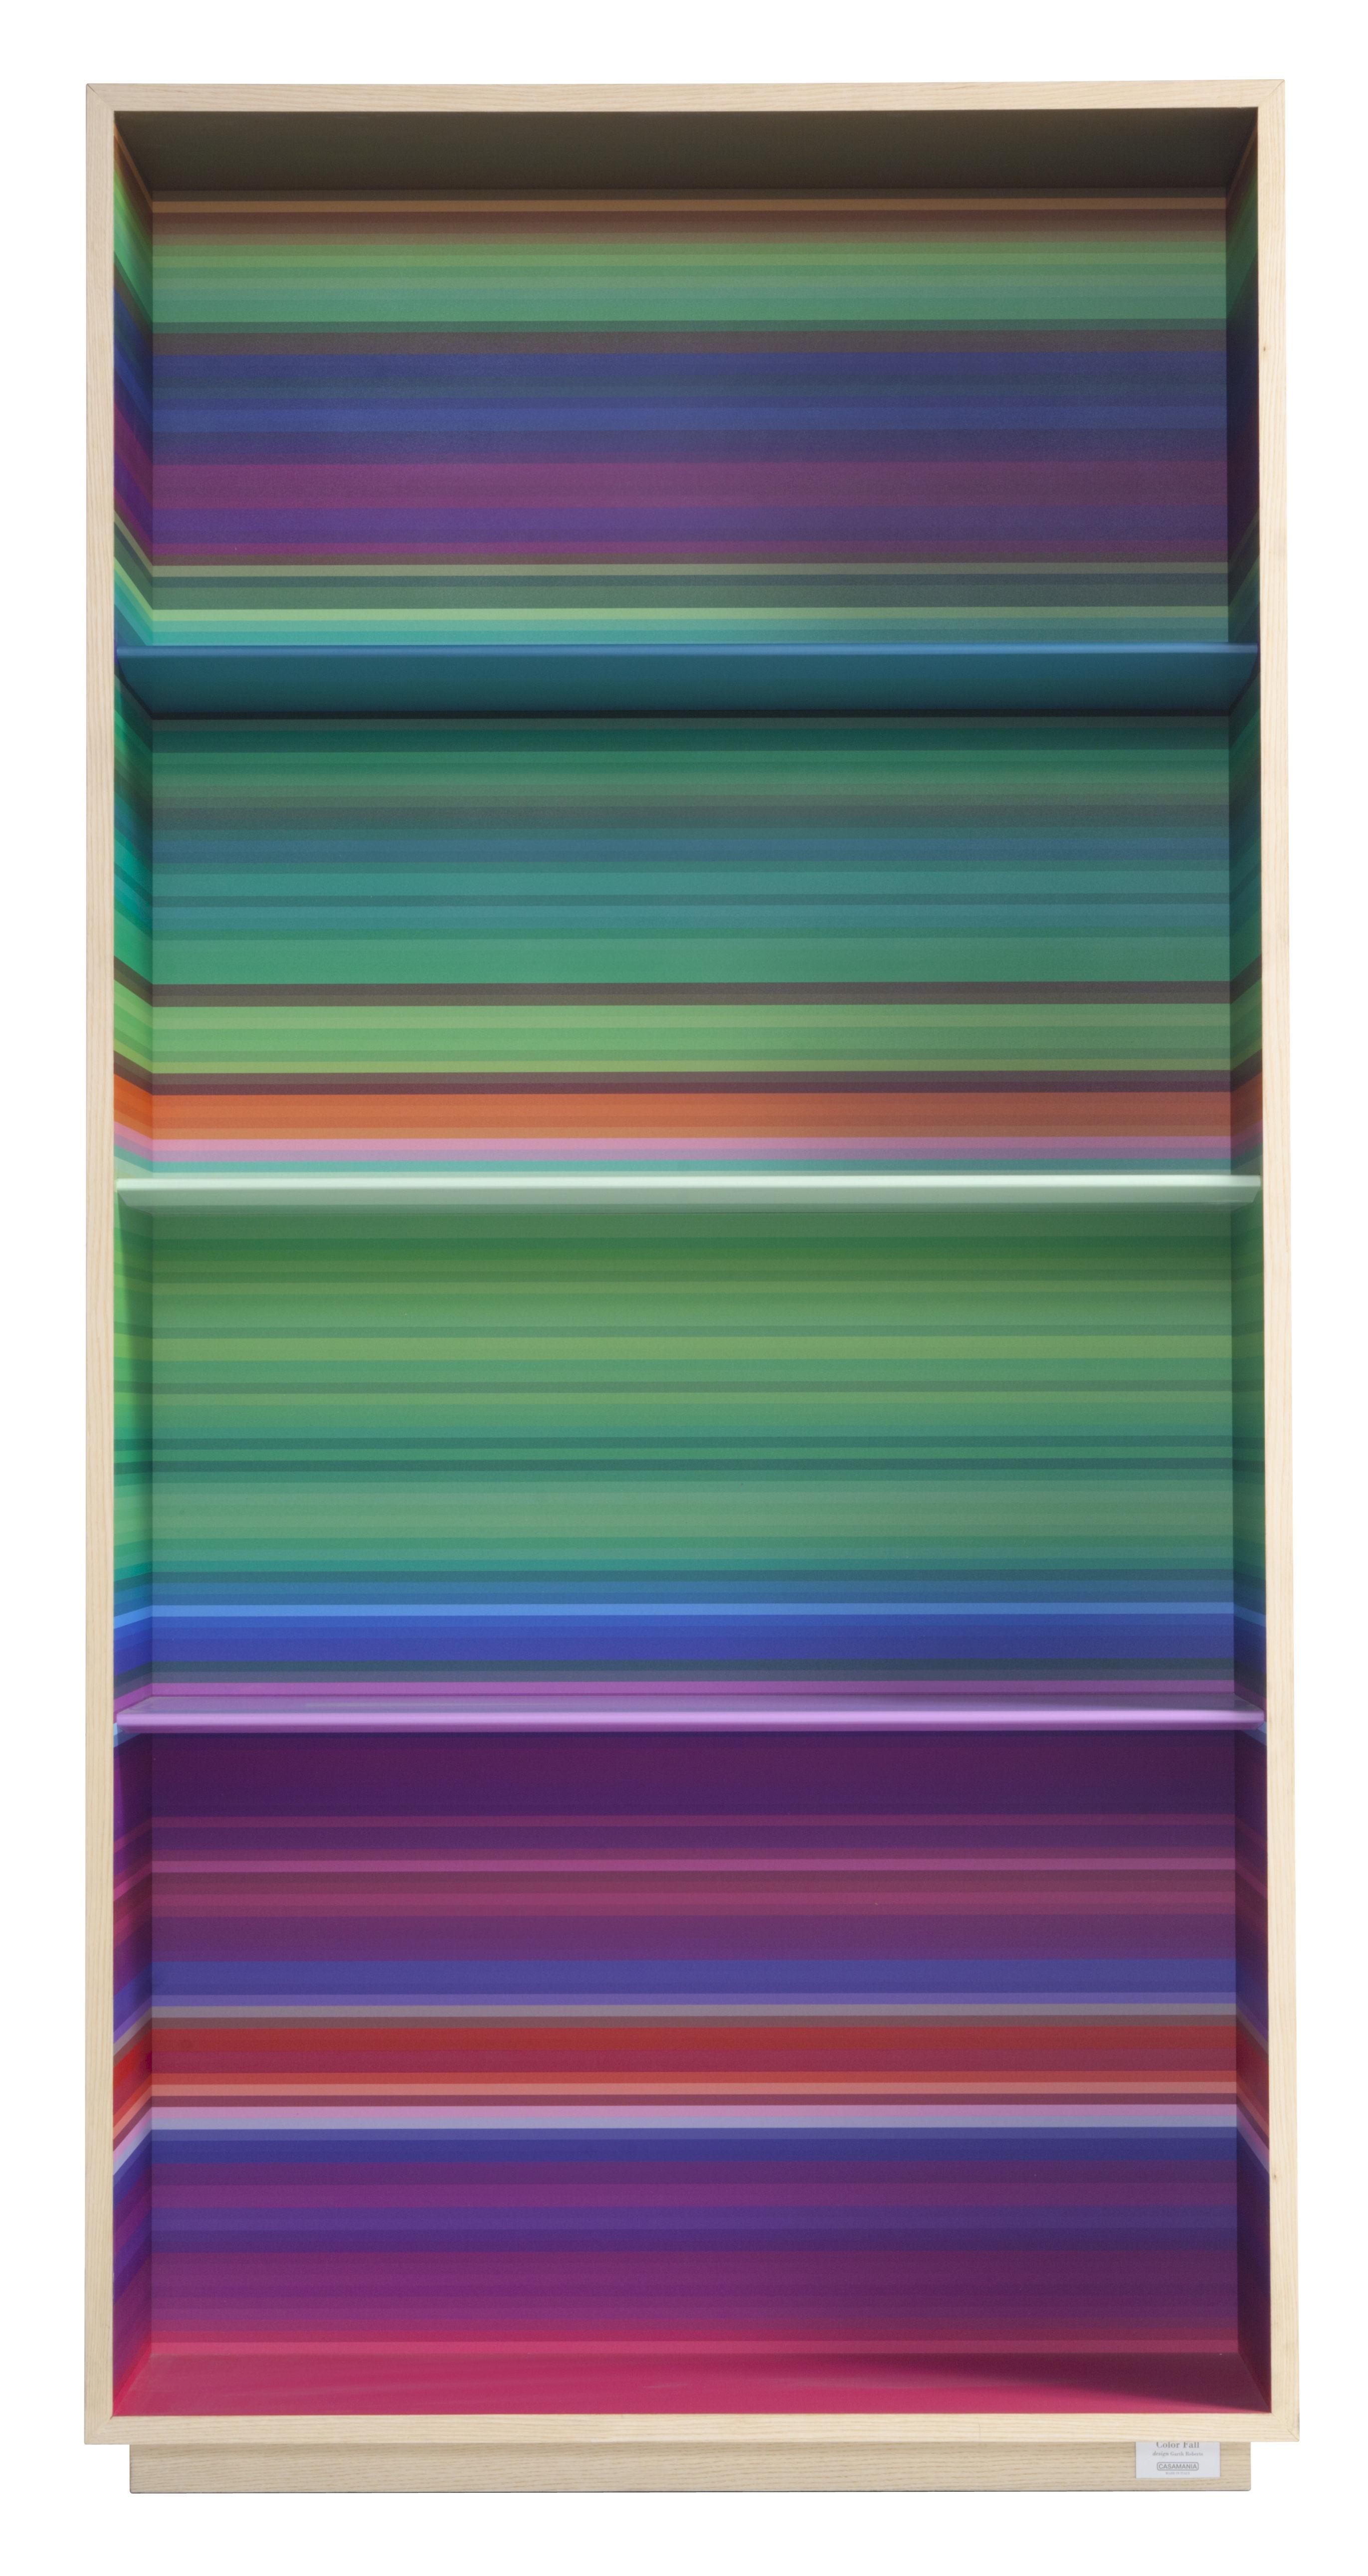 Möbel - Regale und Bücherregale - Color Fall Bücherregal / L 90 x H 160 cm - Casamania - Helles Holz / Innenseite mehrfarbig - Melamin